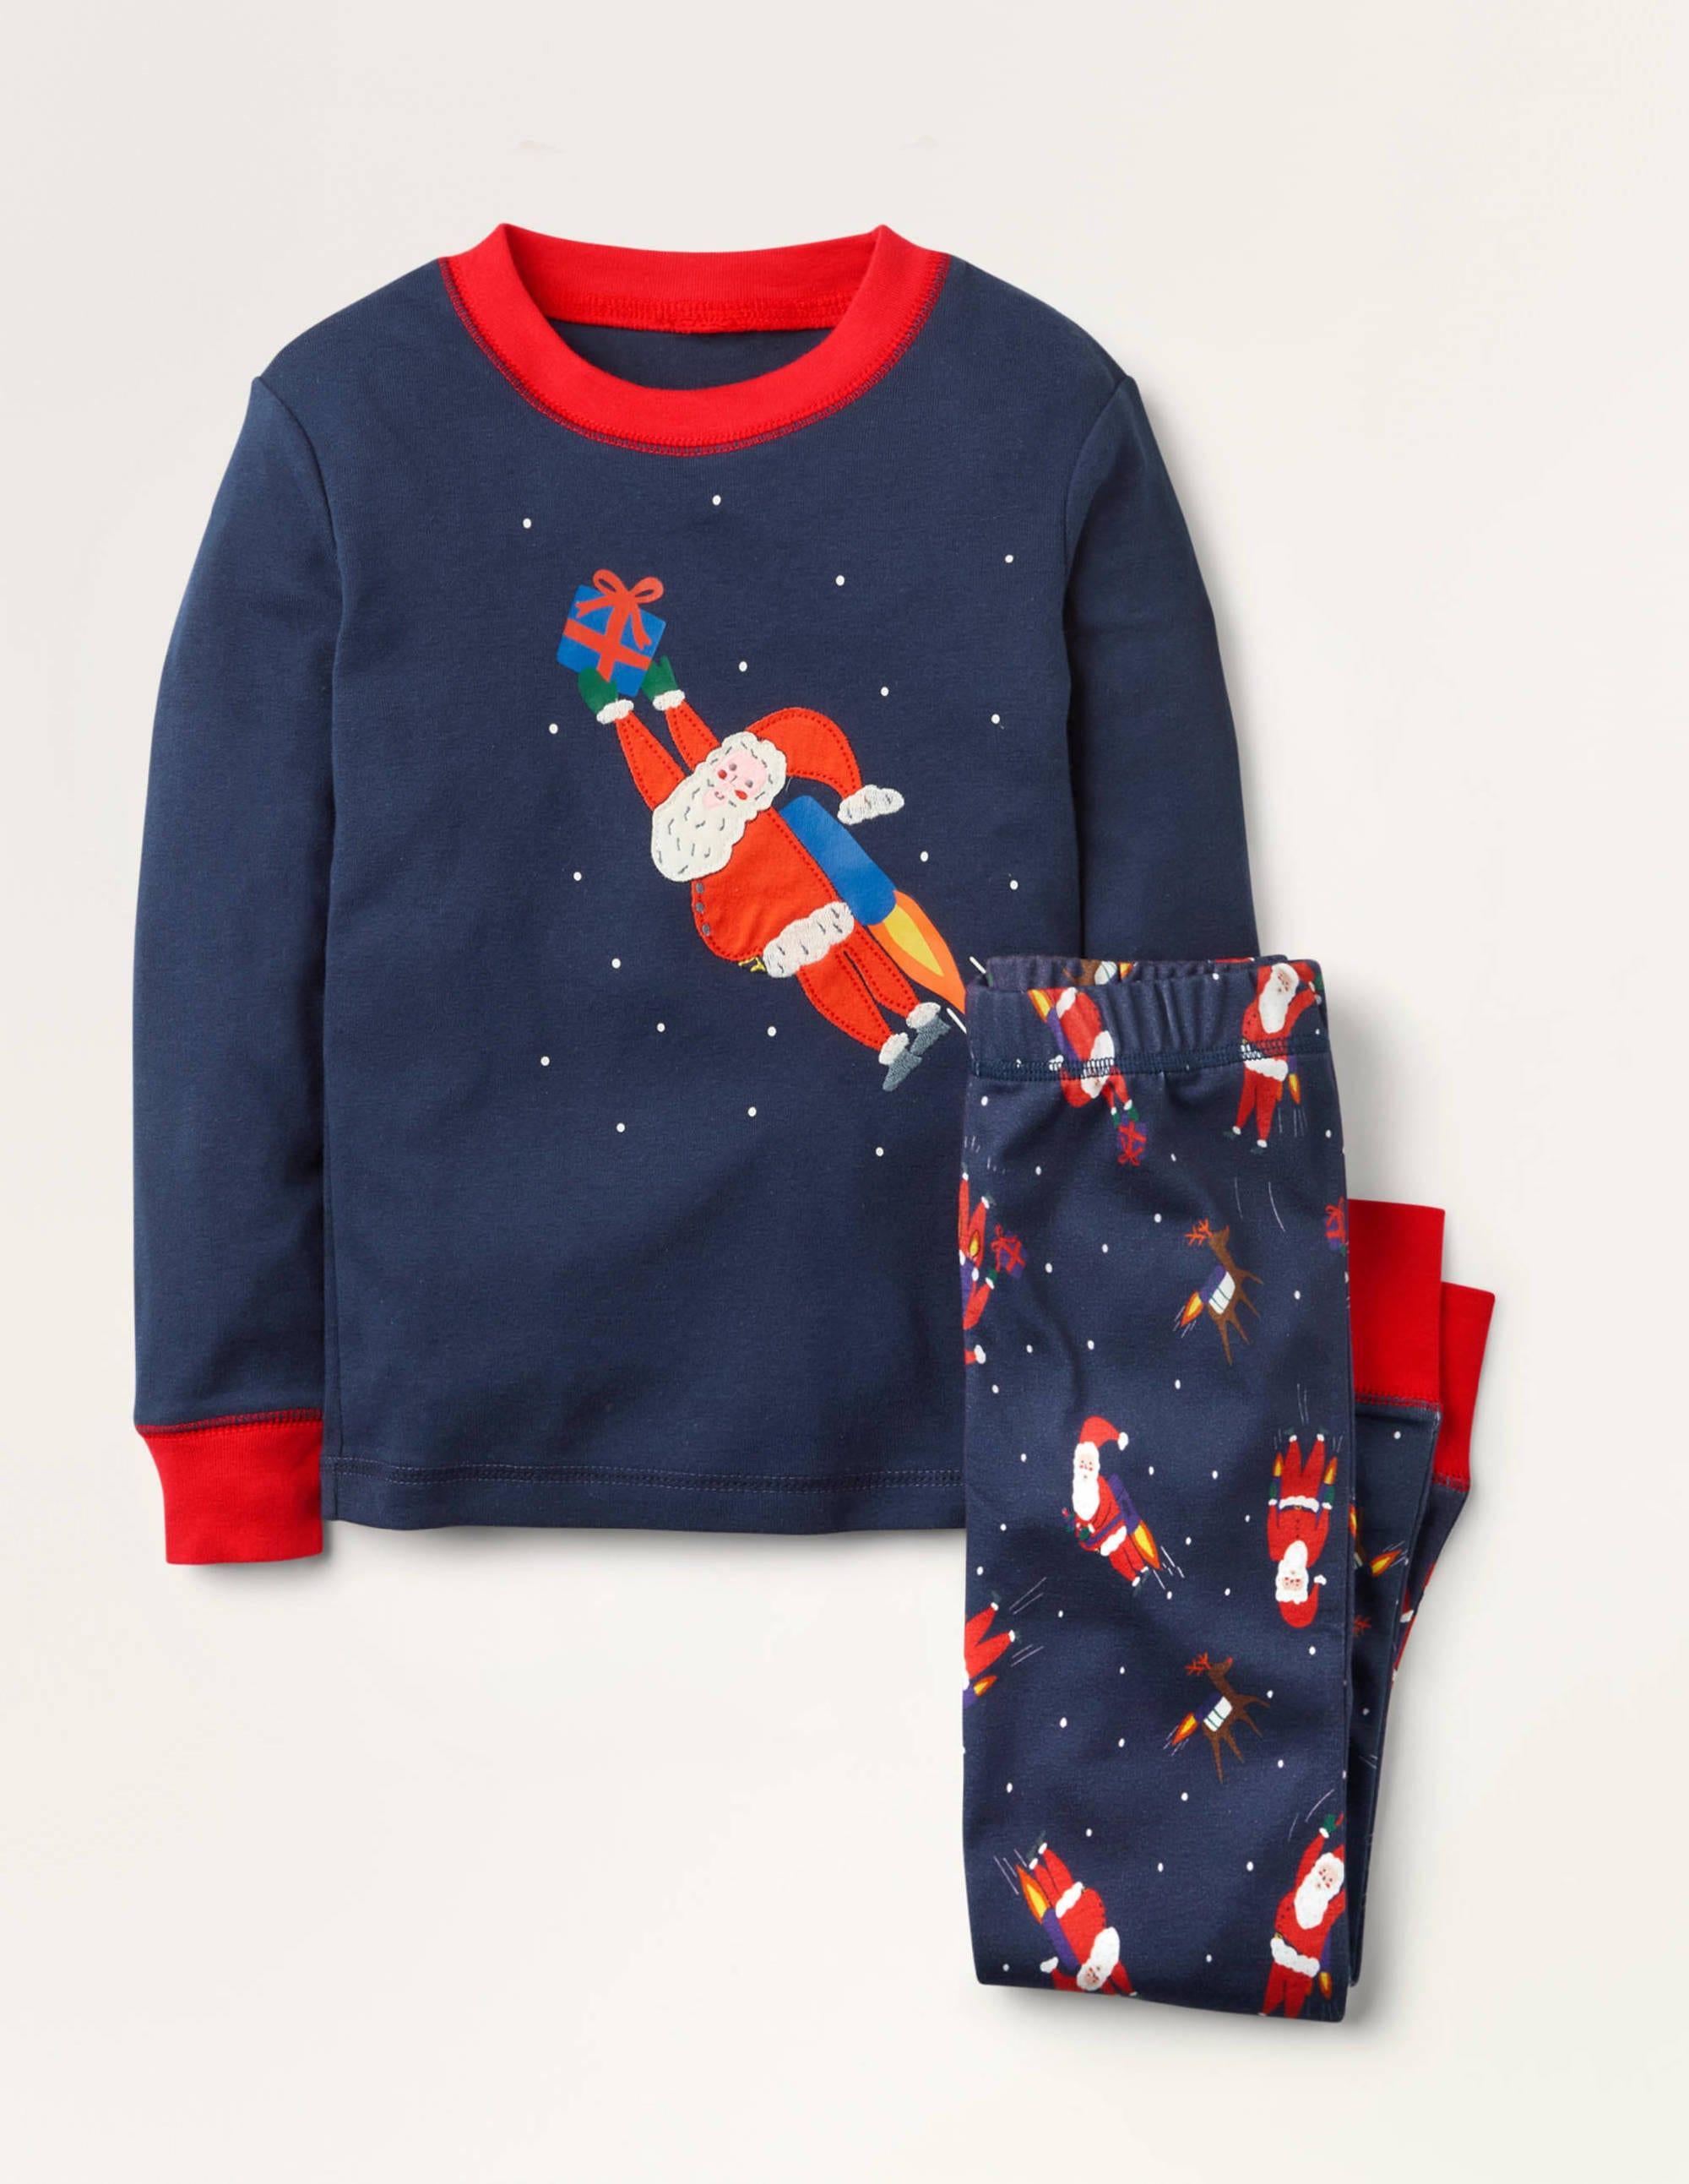 Boden Cosy Applique Long Pajamas - College Navy Jet Pack Santa